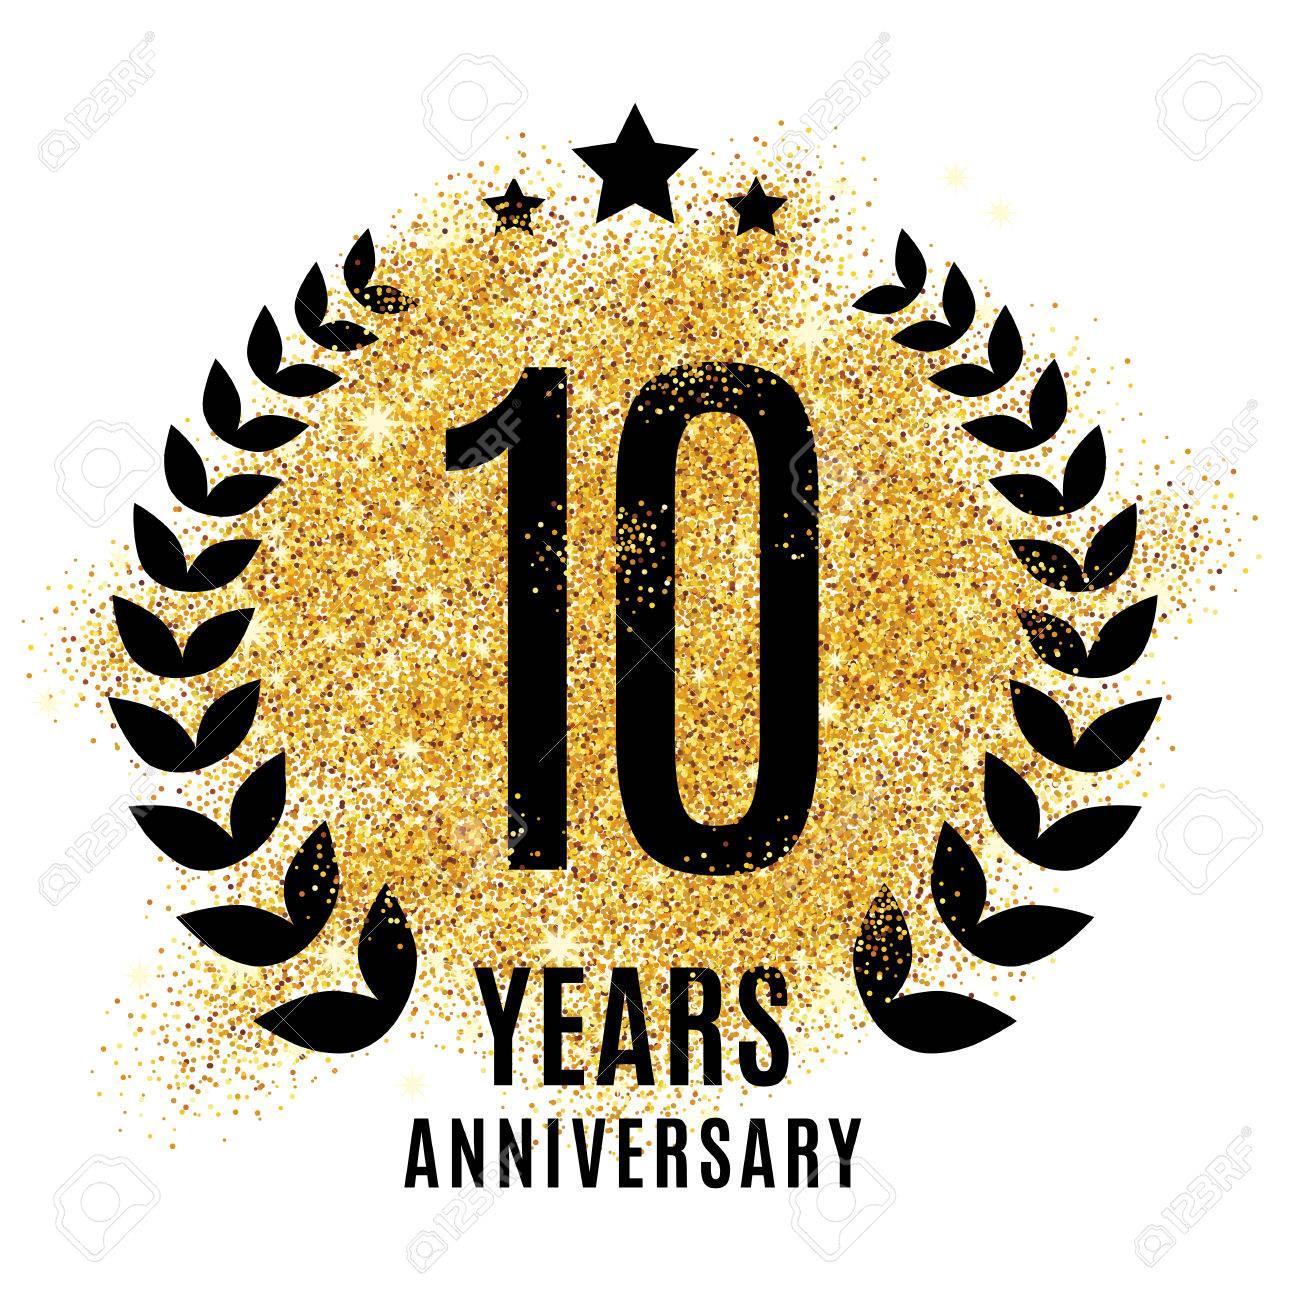 Ten years golden anniversary sign. Gold glitter celebration. Light bright symbol for event, invitation, award, ceremony, greeting. Laurel and star emblem, luxury elegant icon. - 67585539